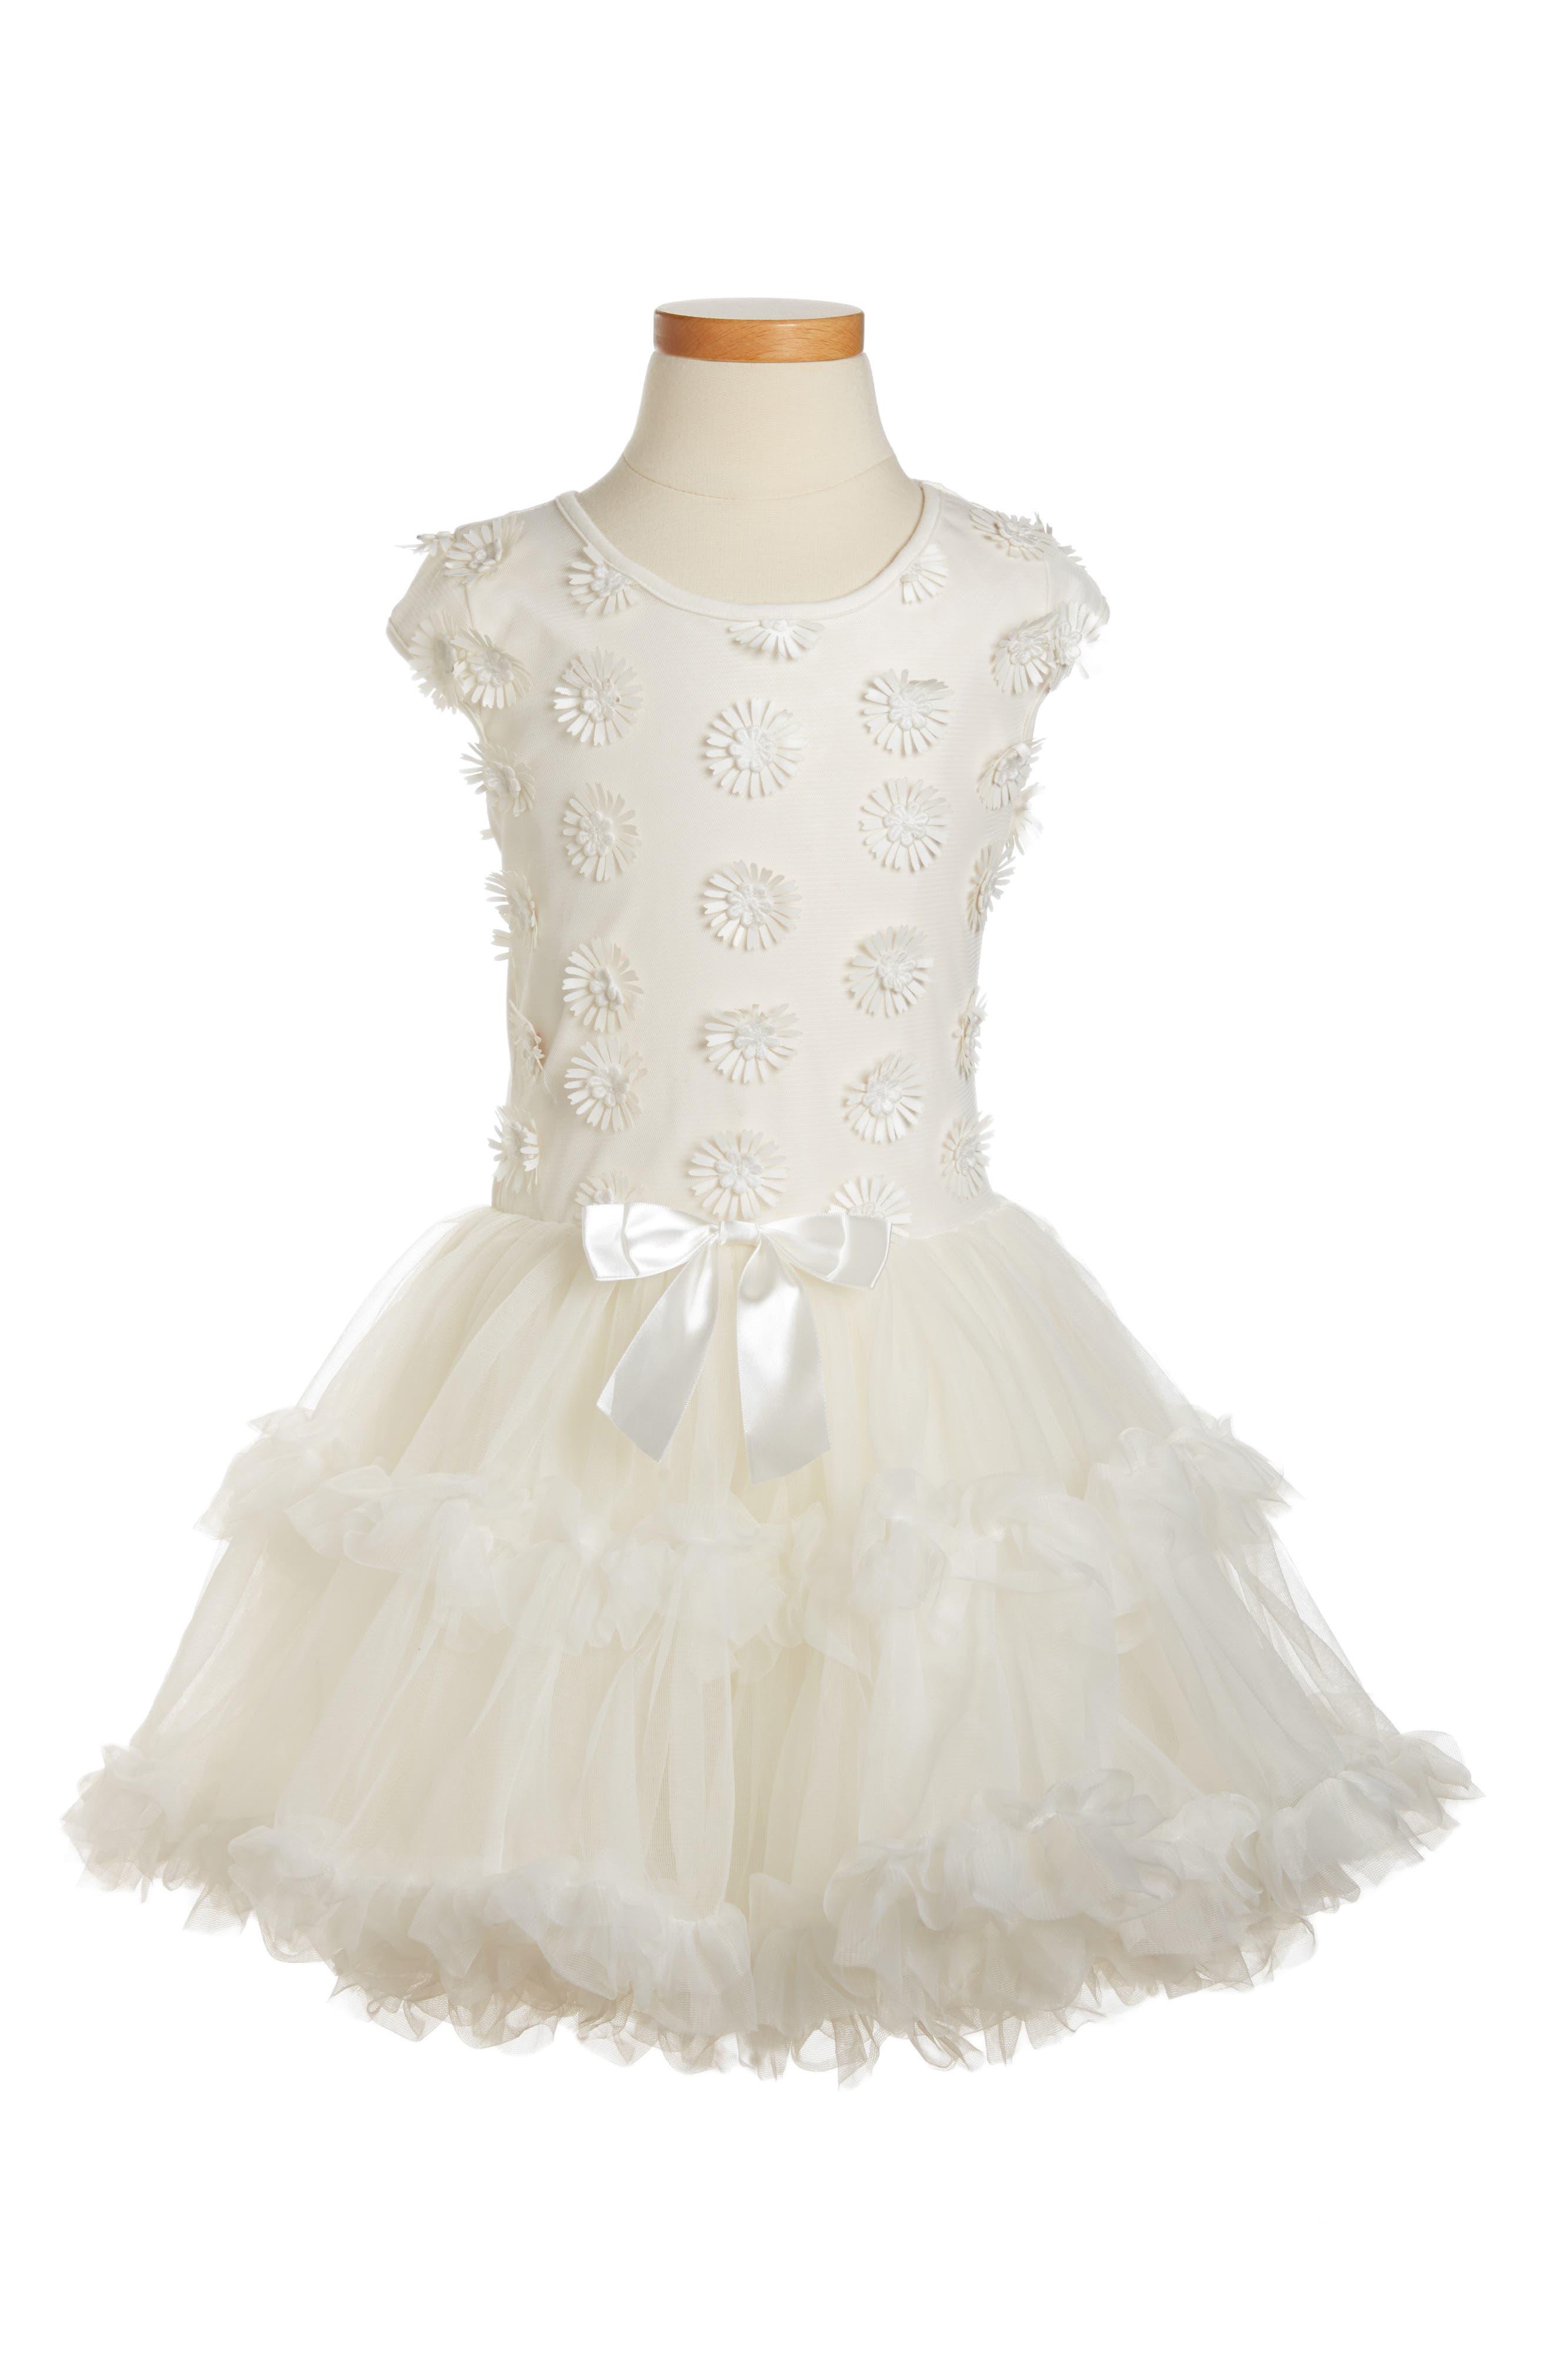 Daisy Pettidress,                         Main,                         color, White